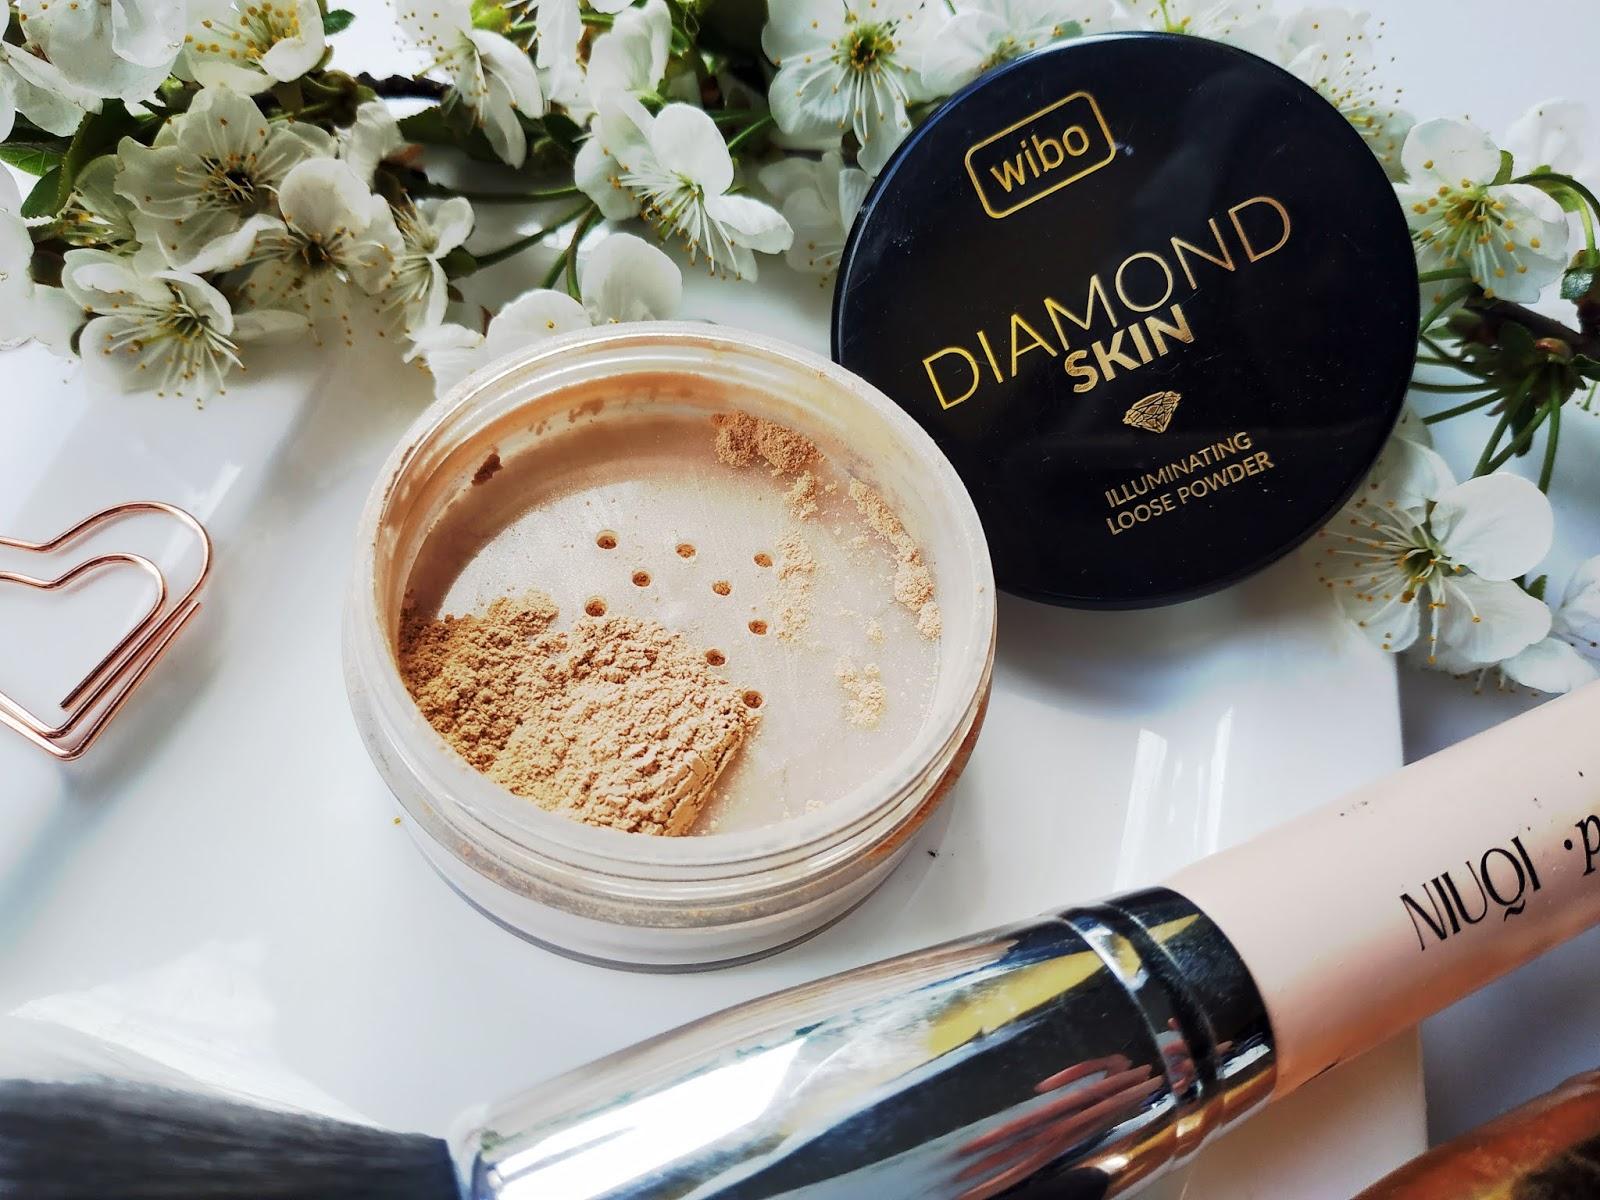 Opinia wibo diamond skin, opinie diamond skin, recenzja wibo diamond skin